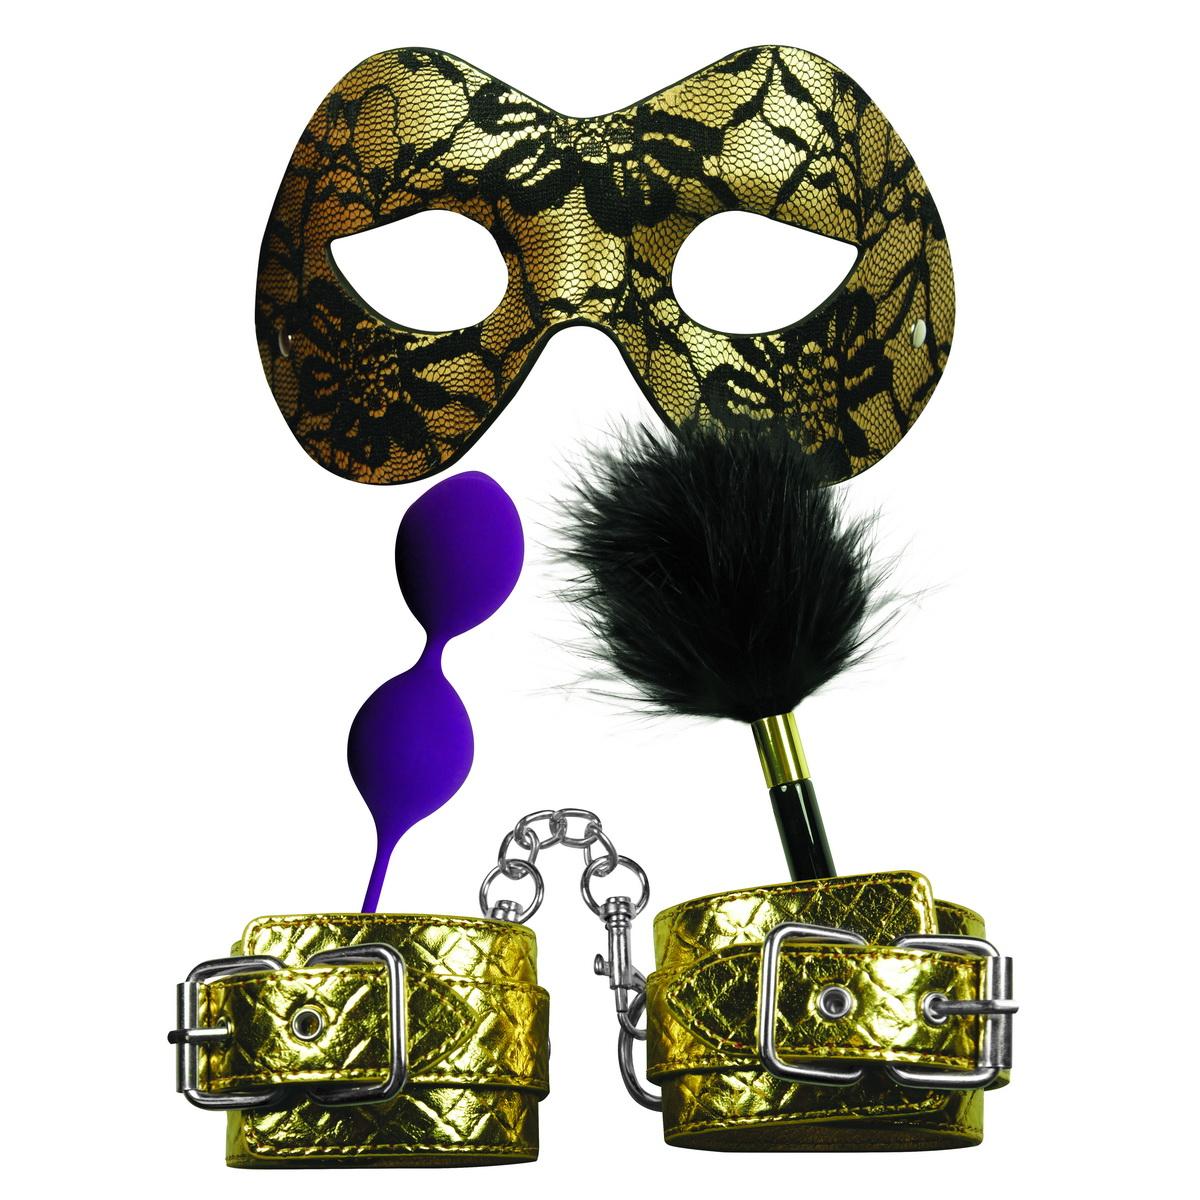 Souprava Sexperiments Masquerade Party